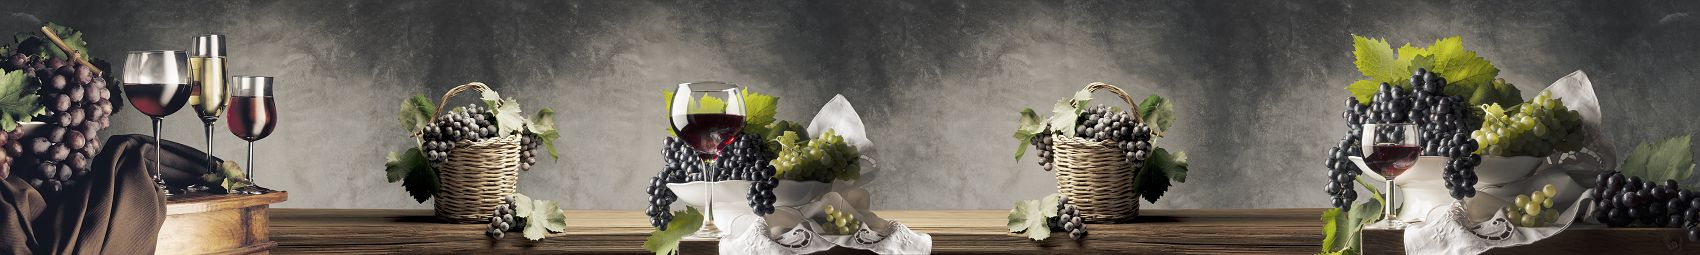 Скинали натюрморт с вином